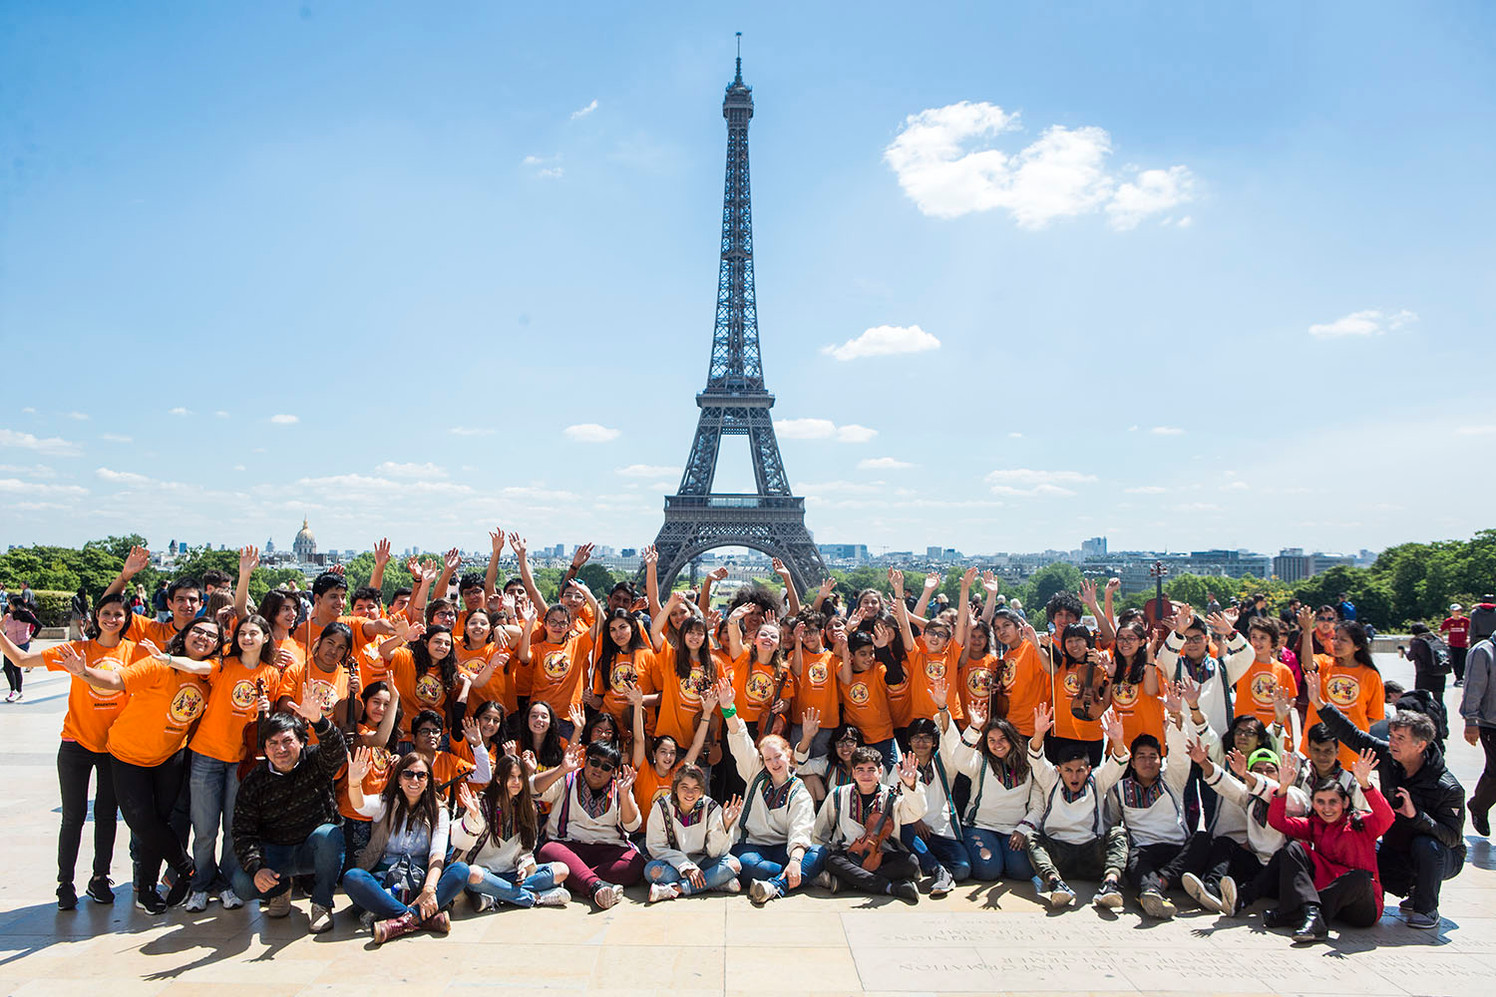 TROCADREO TOUR EIFFEL PARIS